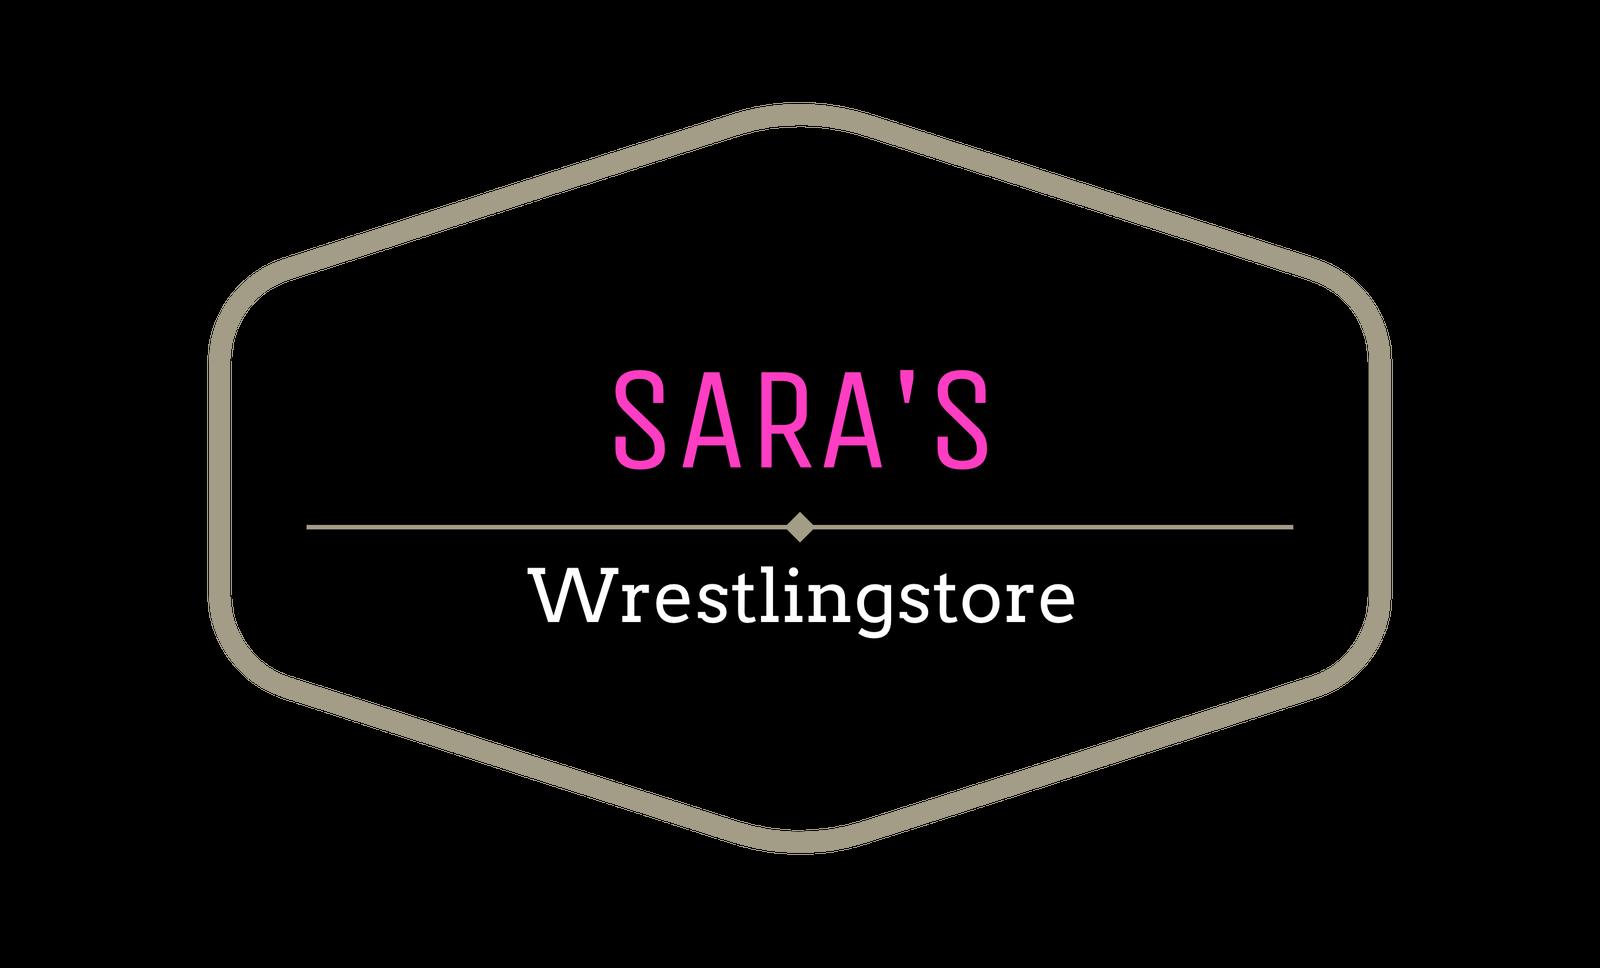 Sara's wrestlingstore